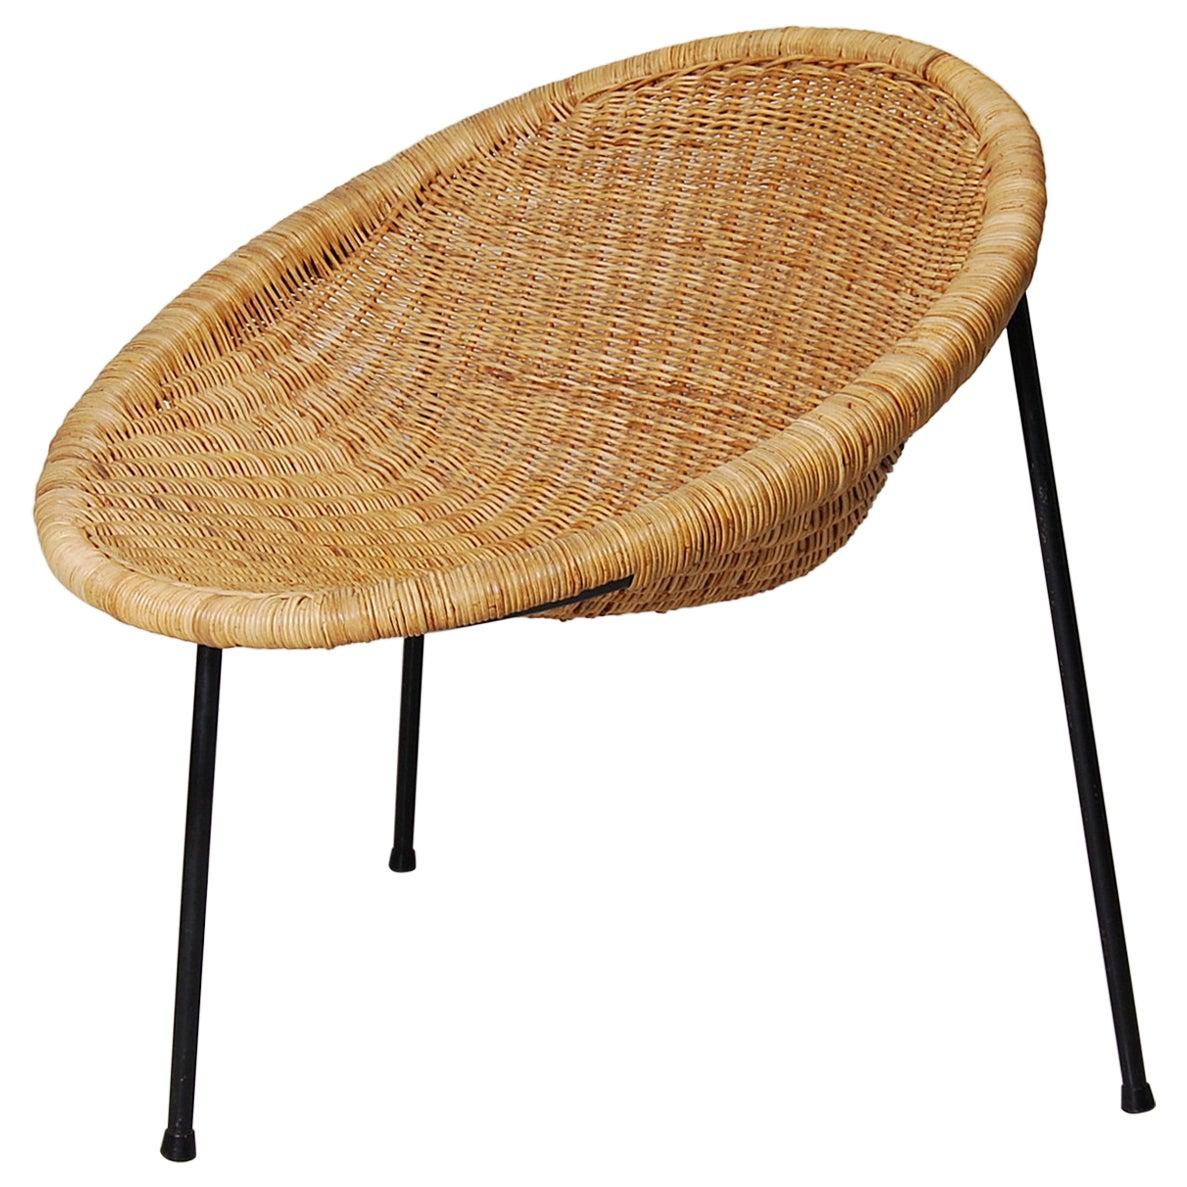 1950s Scandinavian Wicker Bucket / Basket Chair